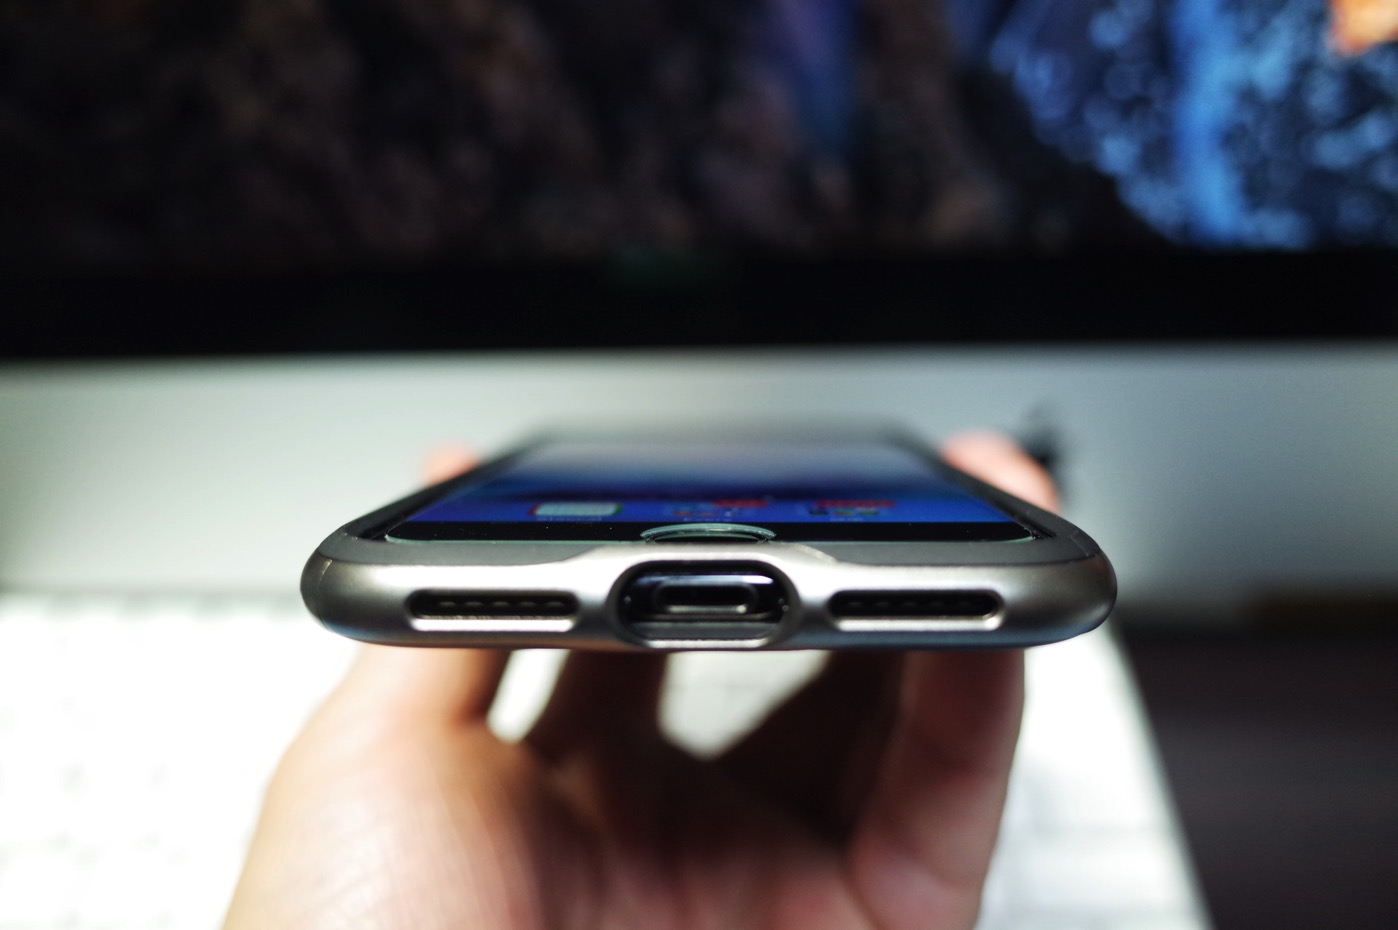 iPhoneケース「ネオ・ハイブリッド米軍MIL規格取得 二重構造バンパー」-15